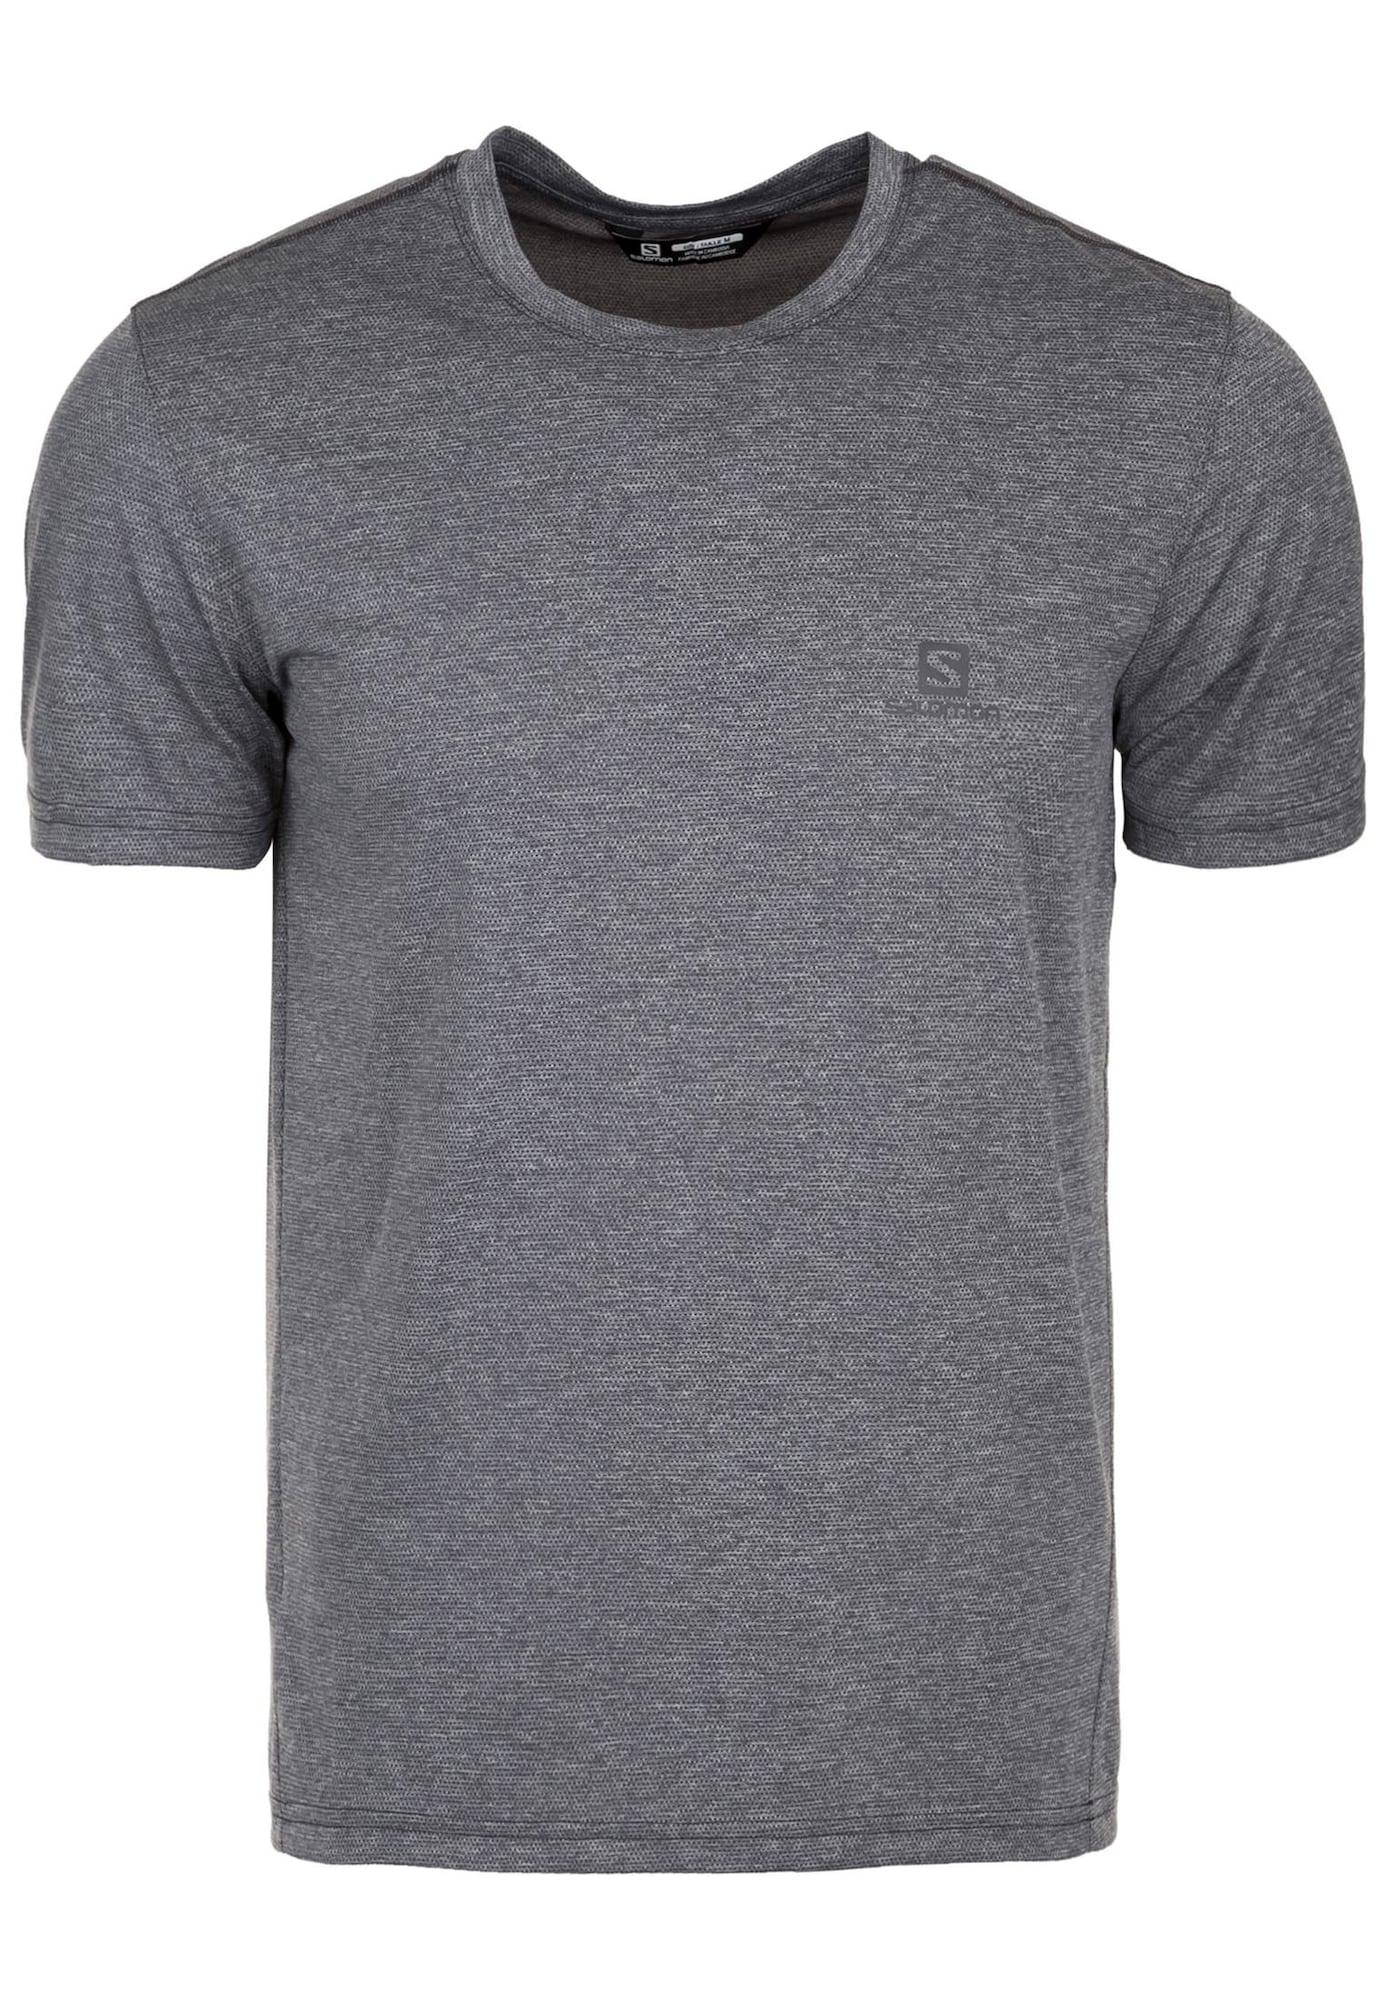 Laufshirt 'Explore Pique' | Sportbekleidung > Sportshirts > Laufshirts | Dunkelgrau | SALOMON